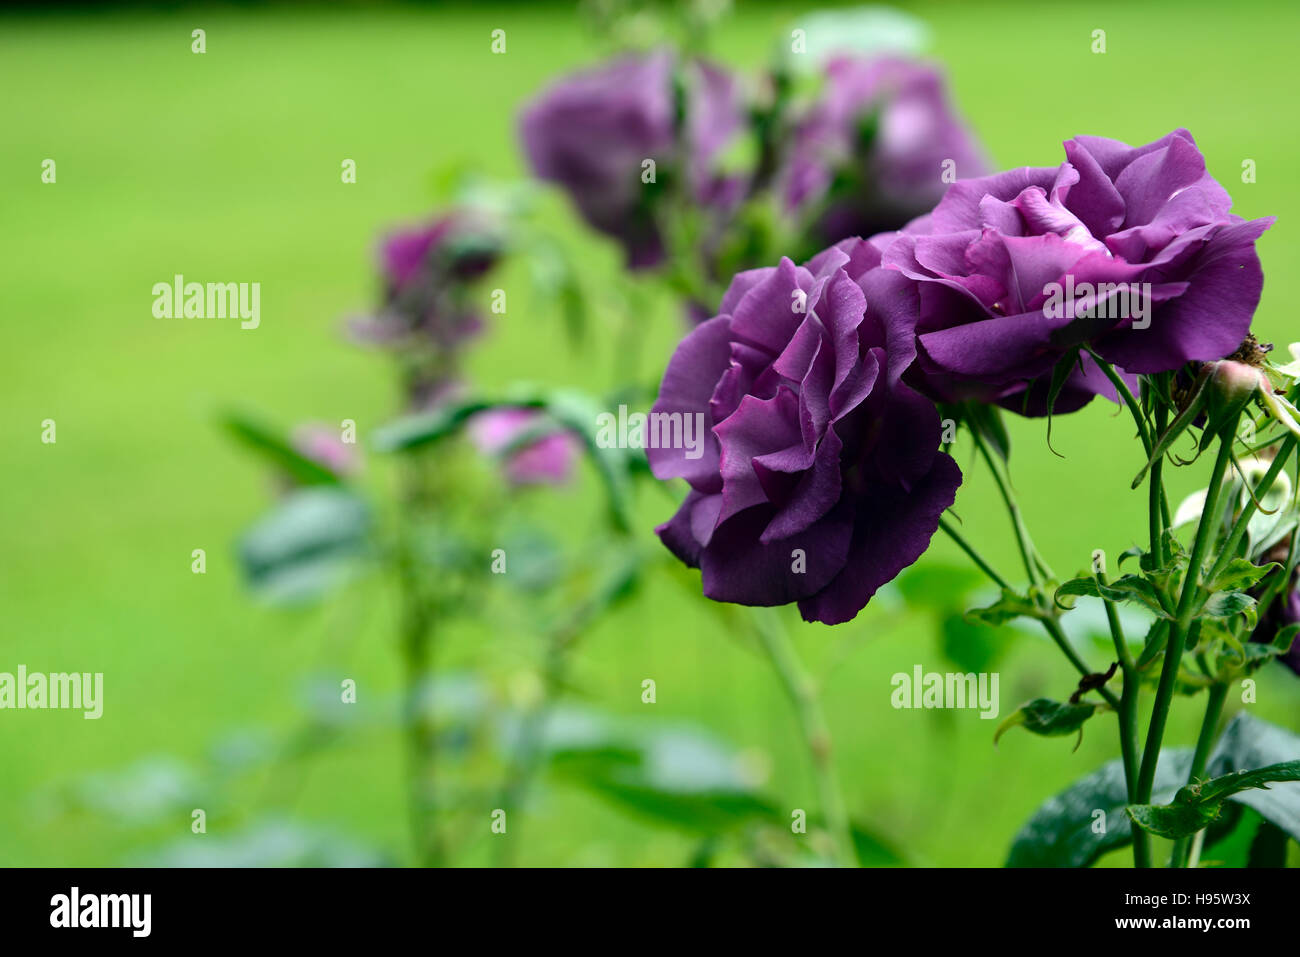 Rosa Rhapsody In Blue Frantasia Rose Purple Flower Flowers Bloom